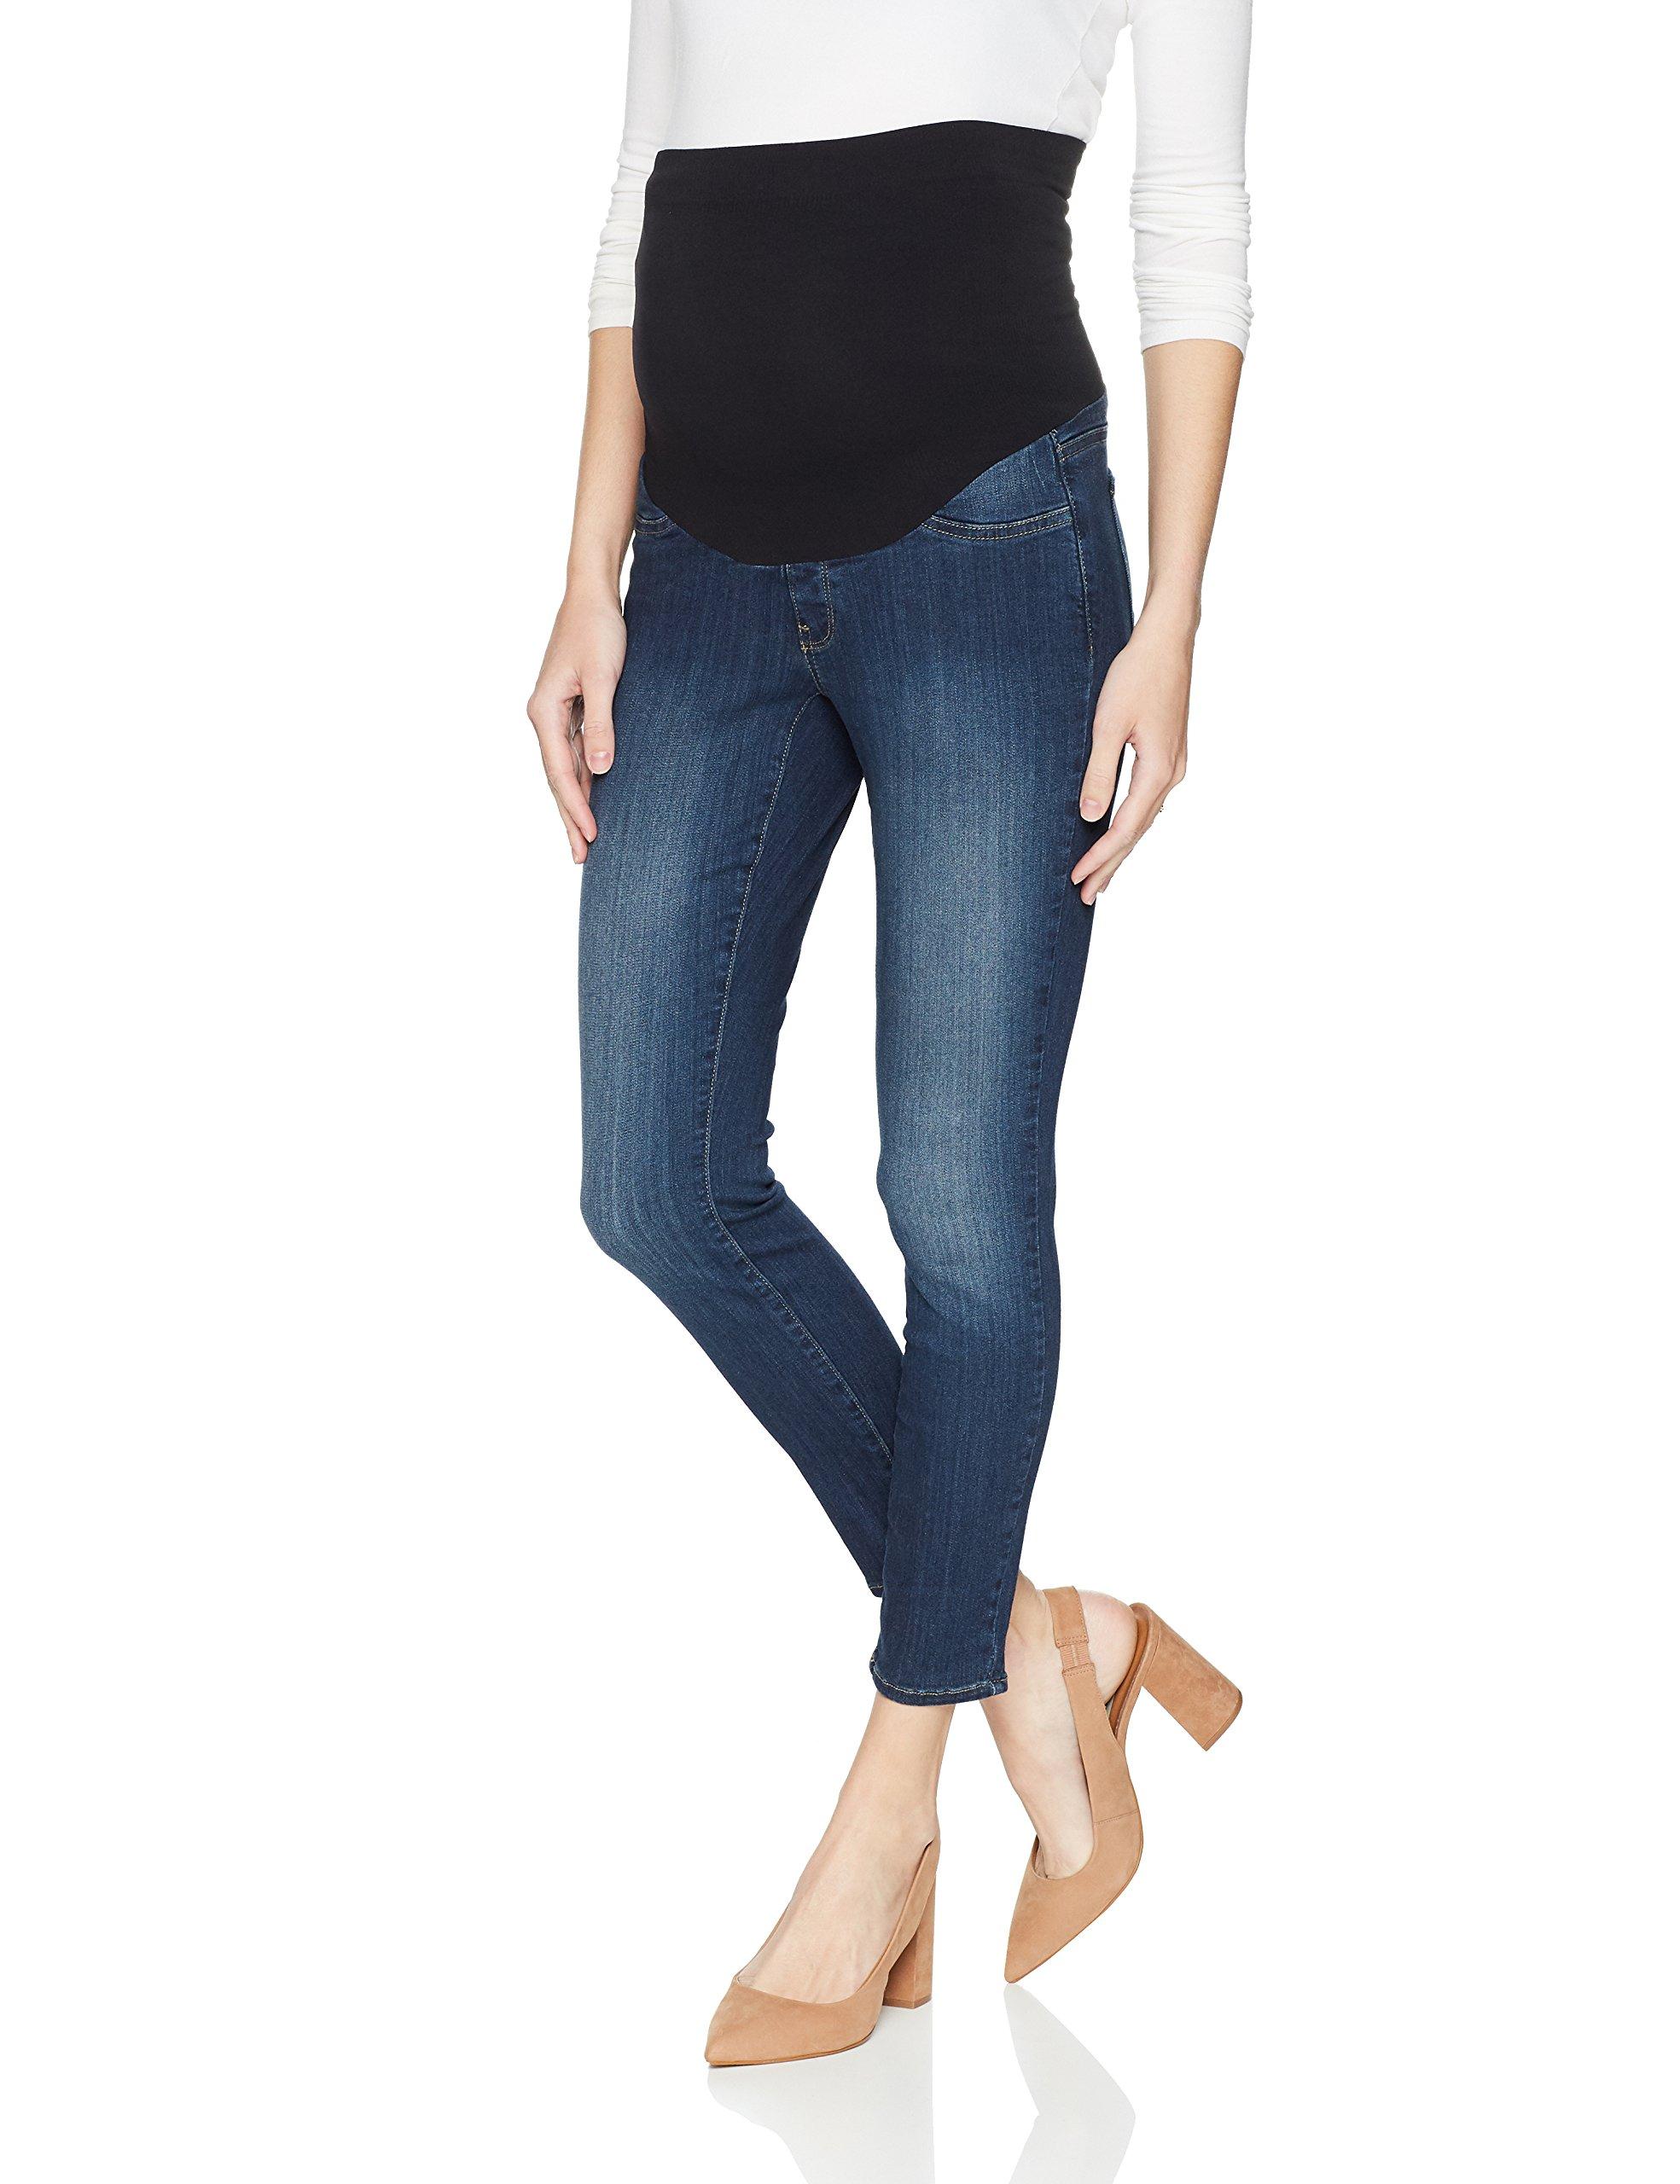 NYDJ Women's Skinny Maternity Ankle Jean in Sure Stretch Denim, Big sur, 6 by NYDJ